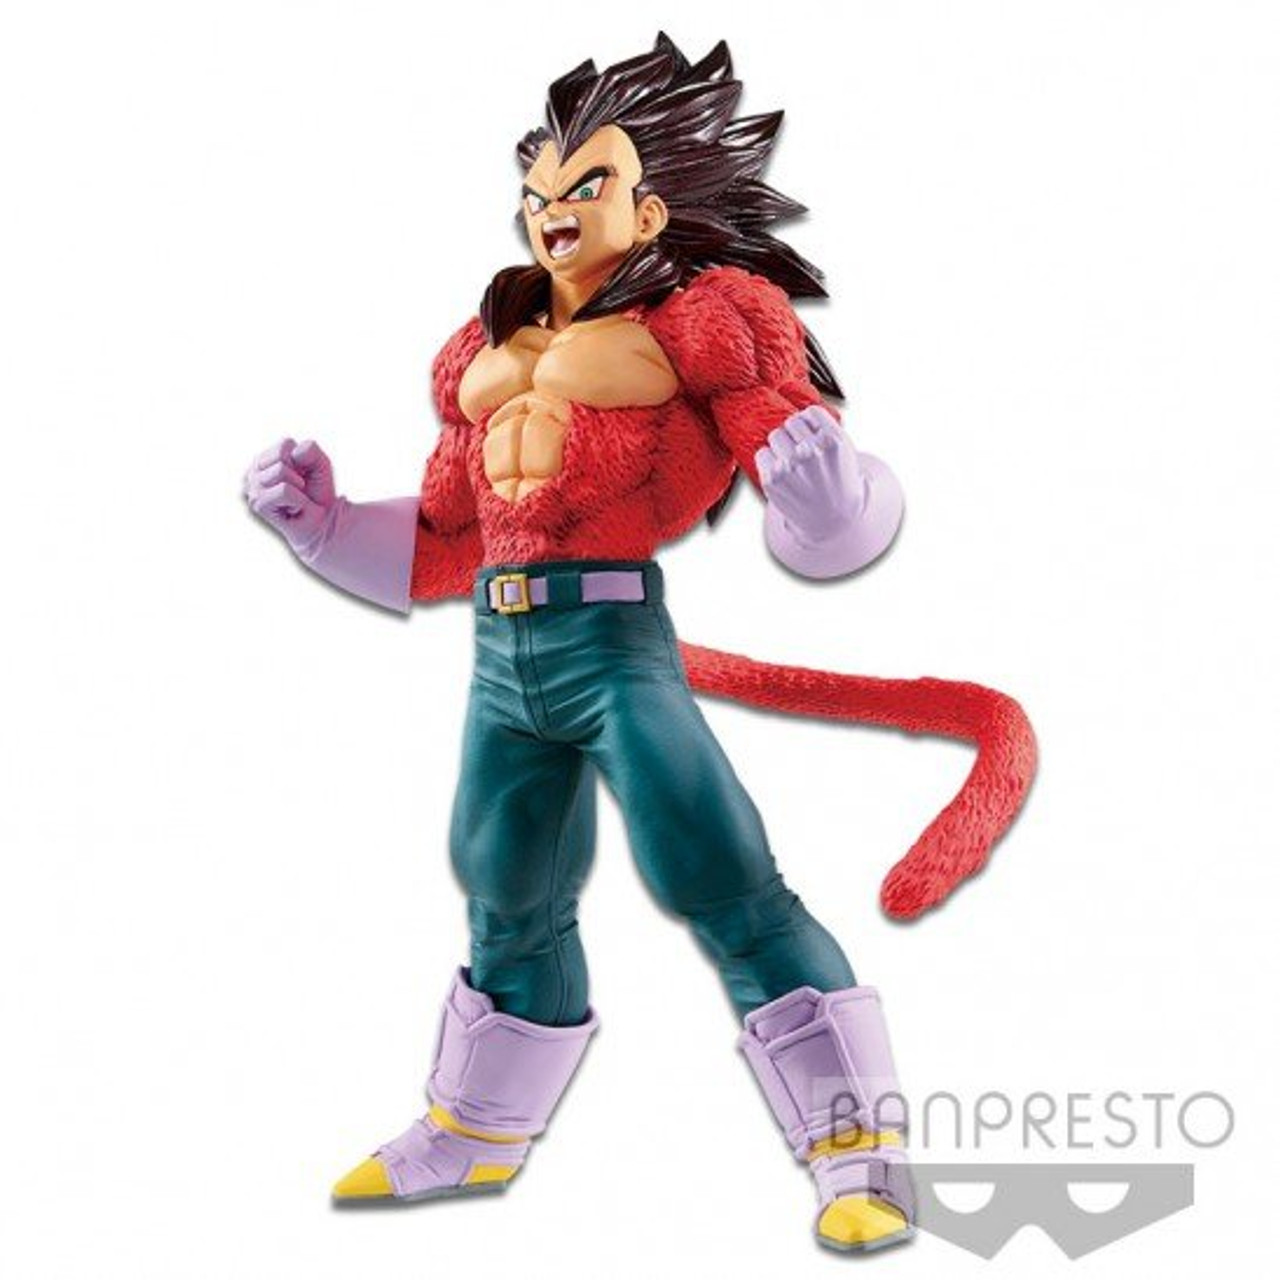 NEW Banpresto Dragon Ball GT Super Saiyan 4 Goku Blood of Saiyans Special III F